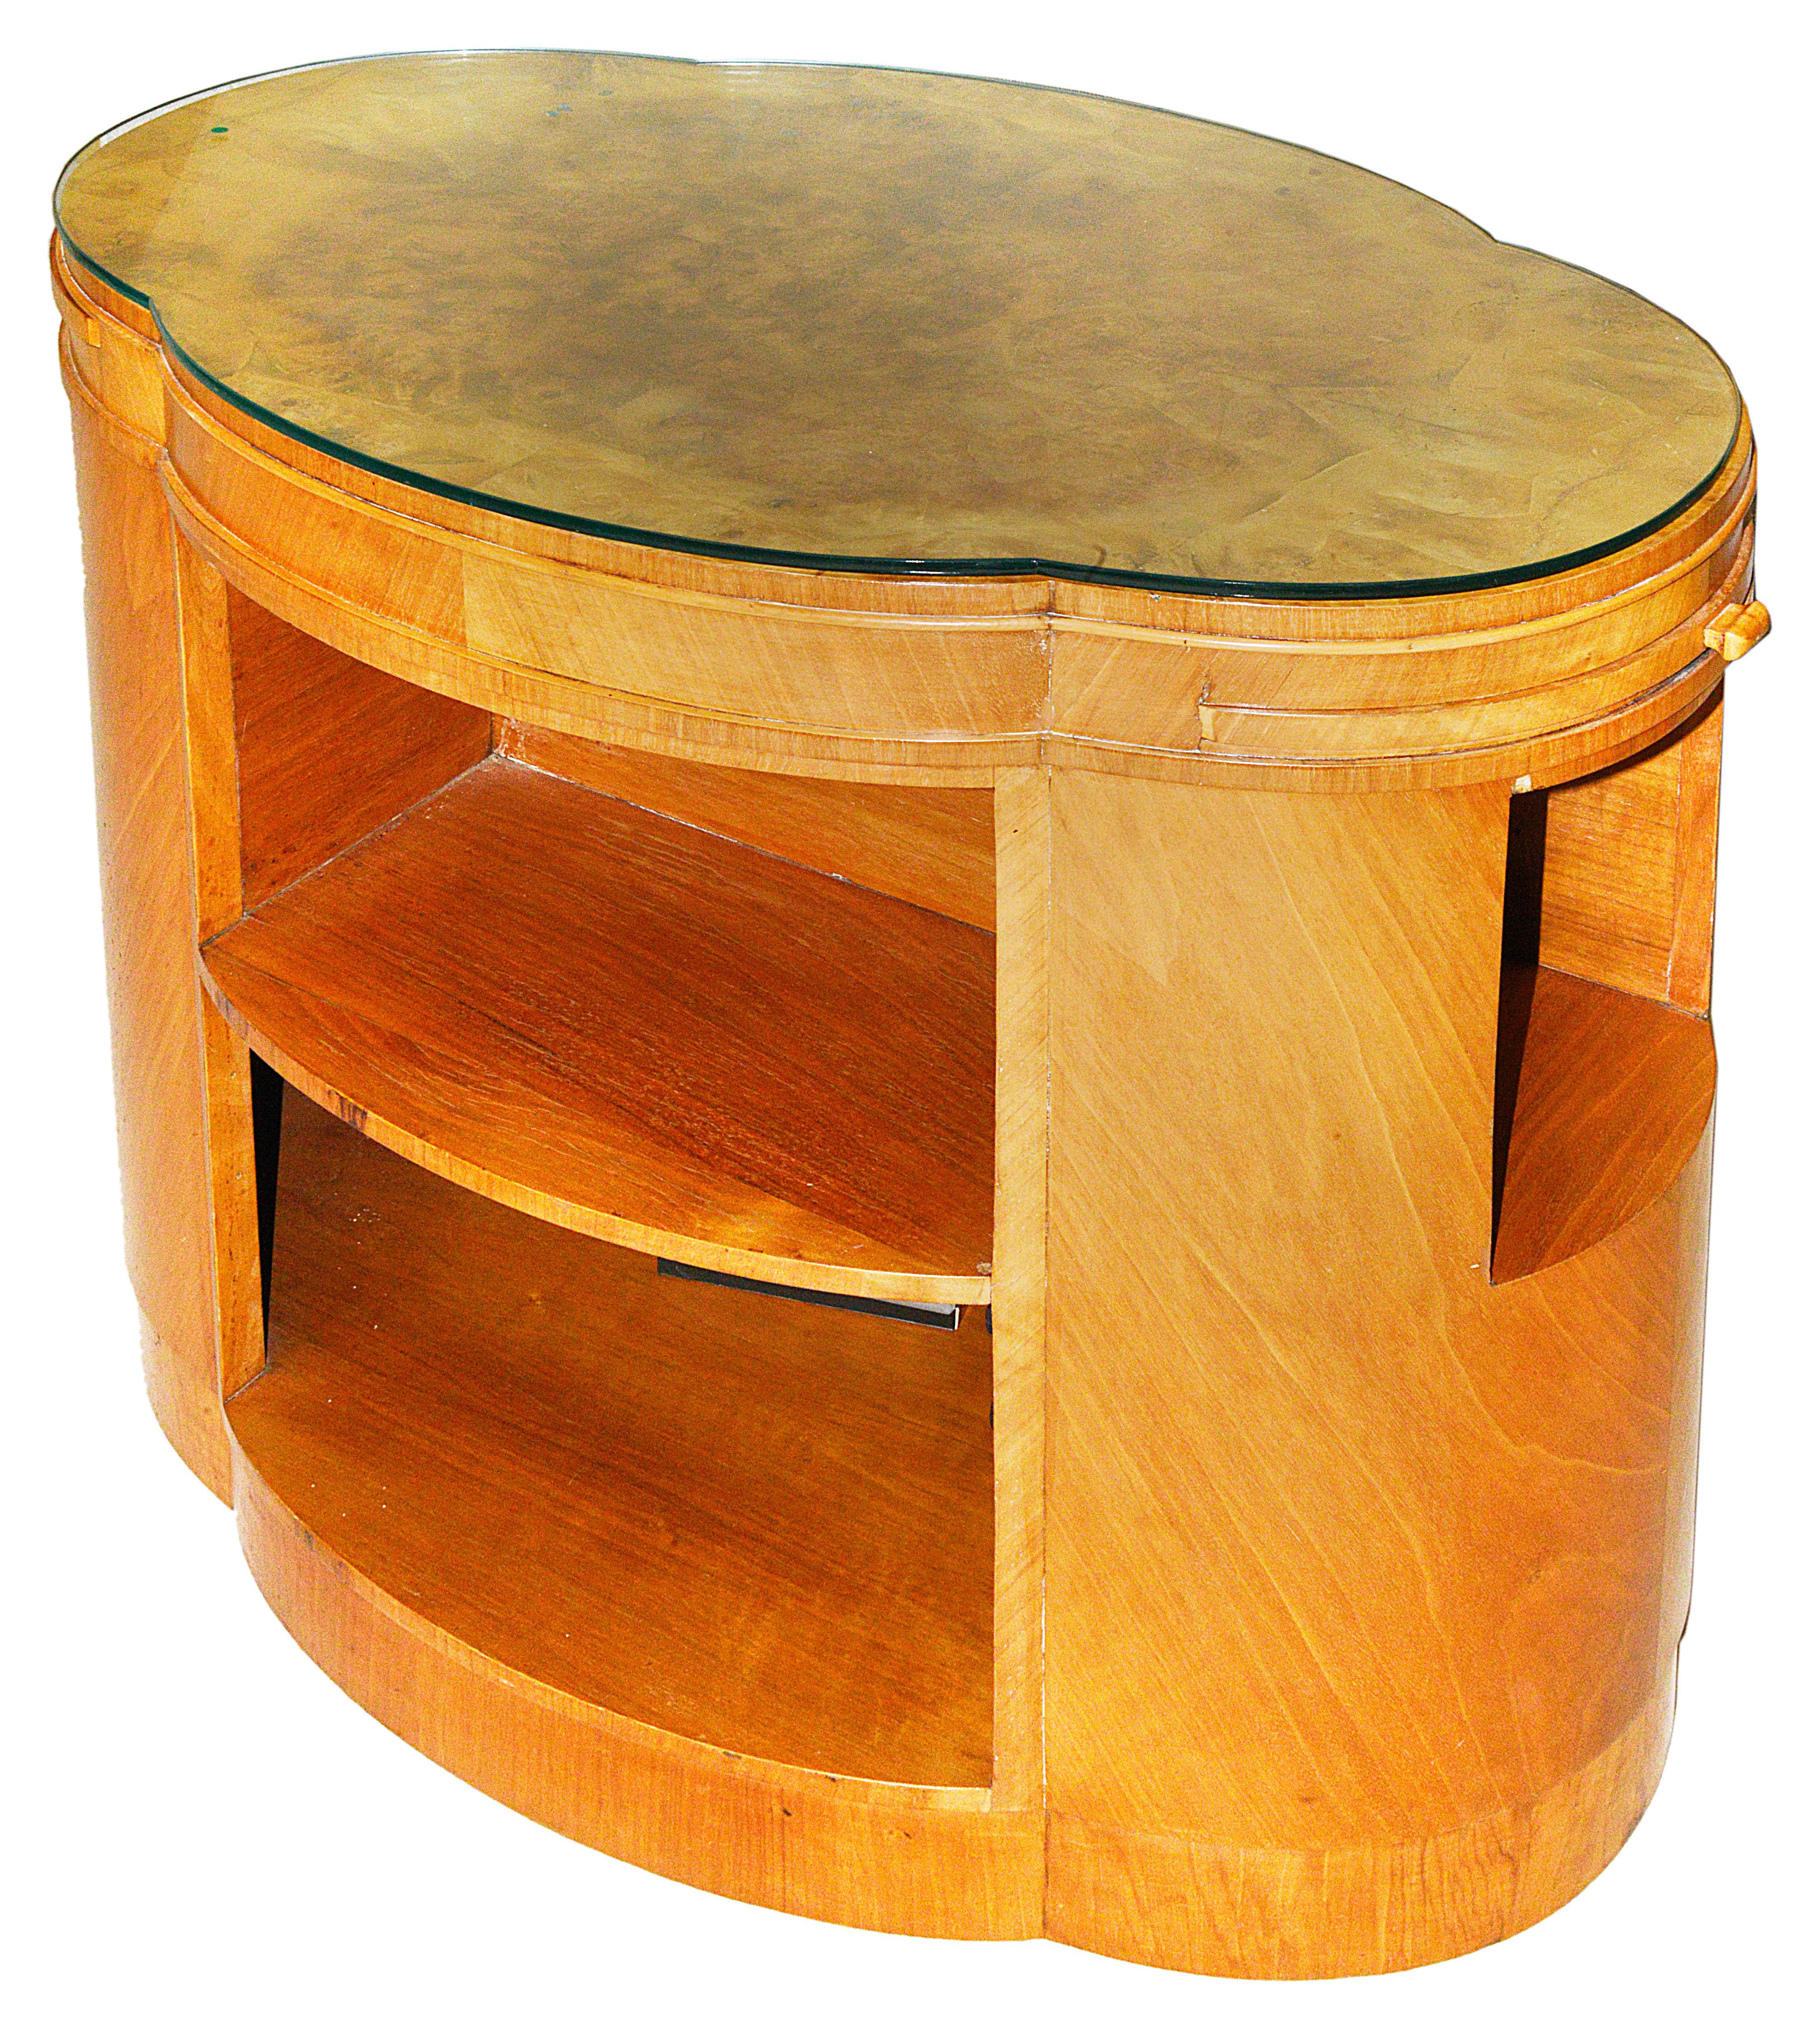 Lot 6 - An Art Deco walnut cloud occasional table c1930s